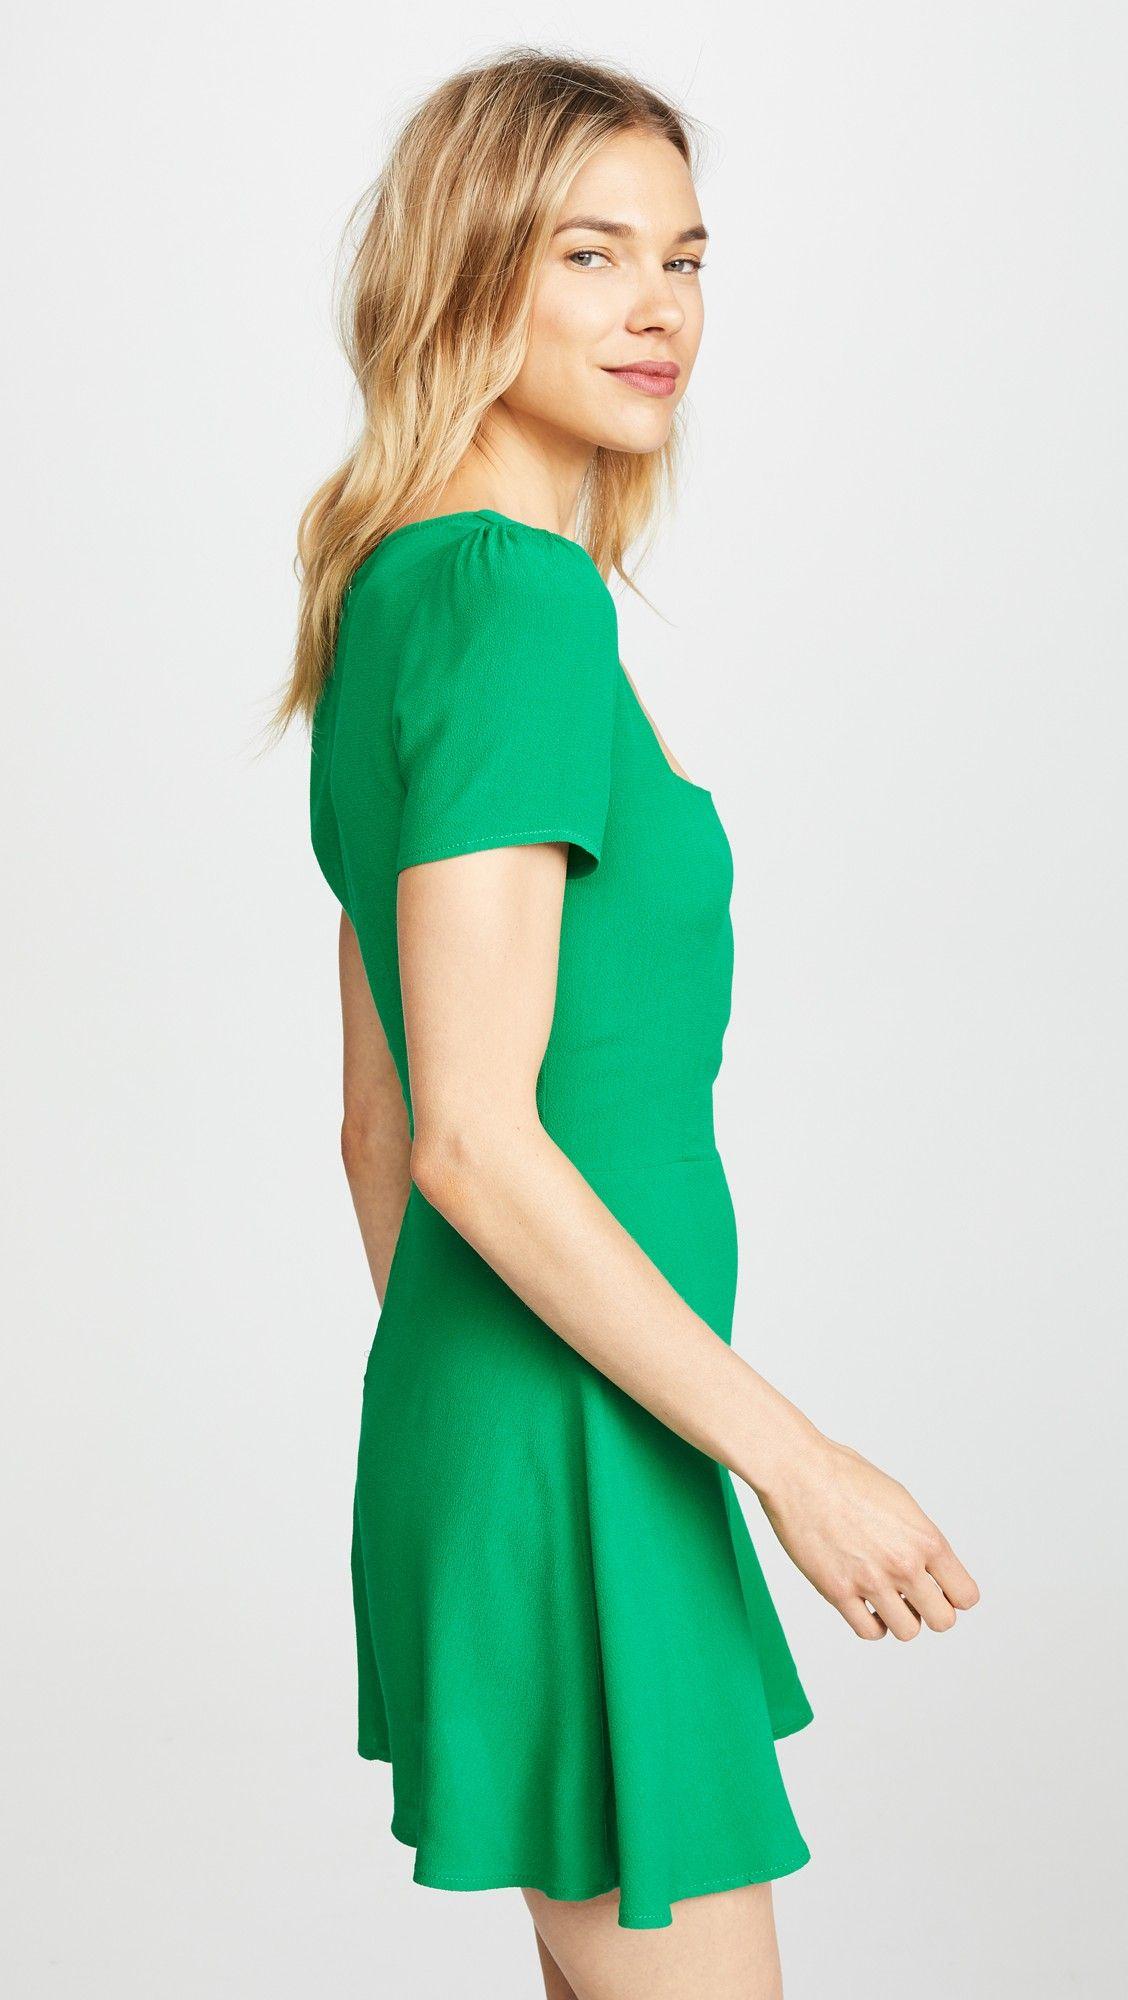 784d31b181bd Flynn Skye Maiden Mini Dress | 15% off 1st app order use code: 15FORYOU